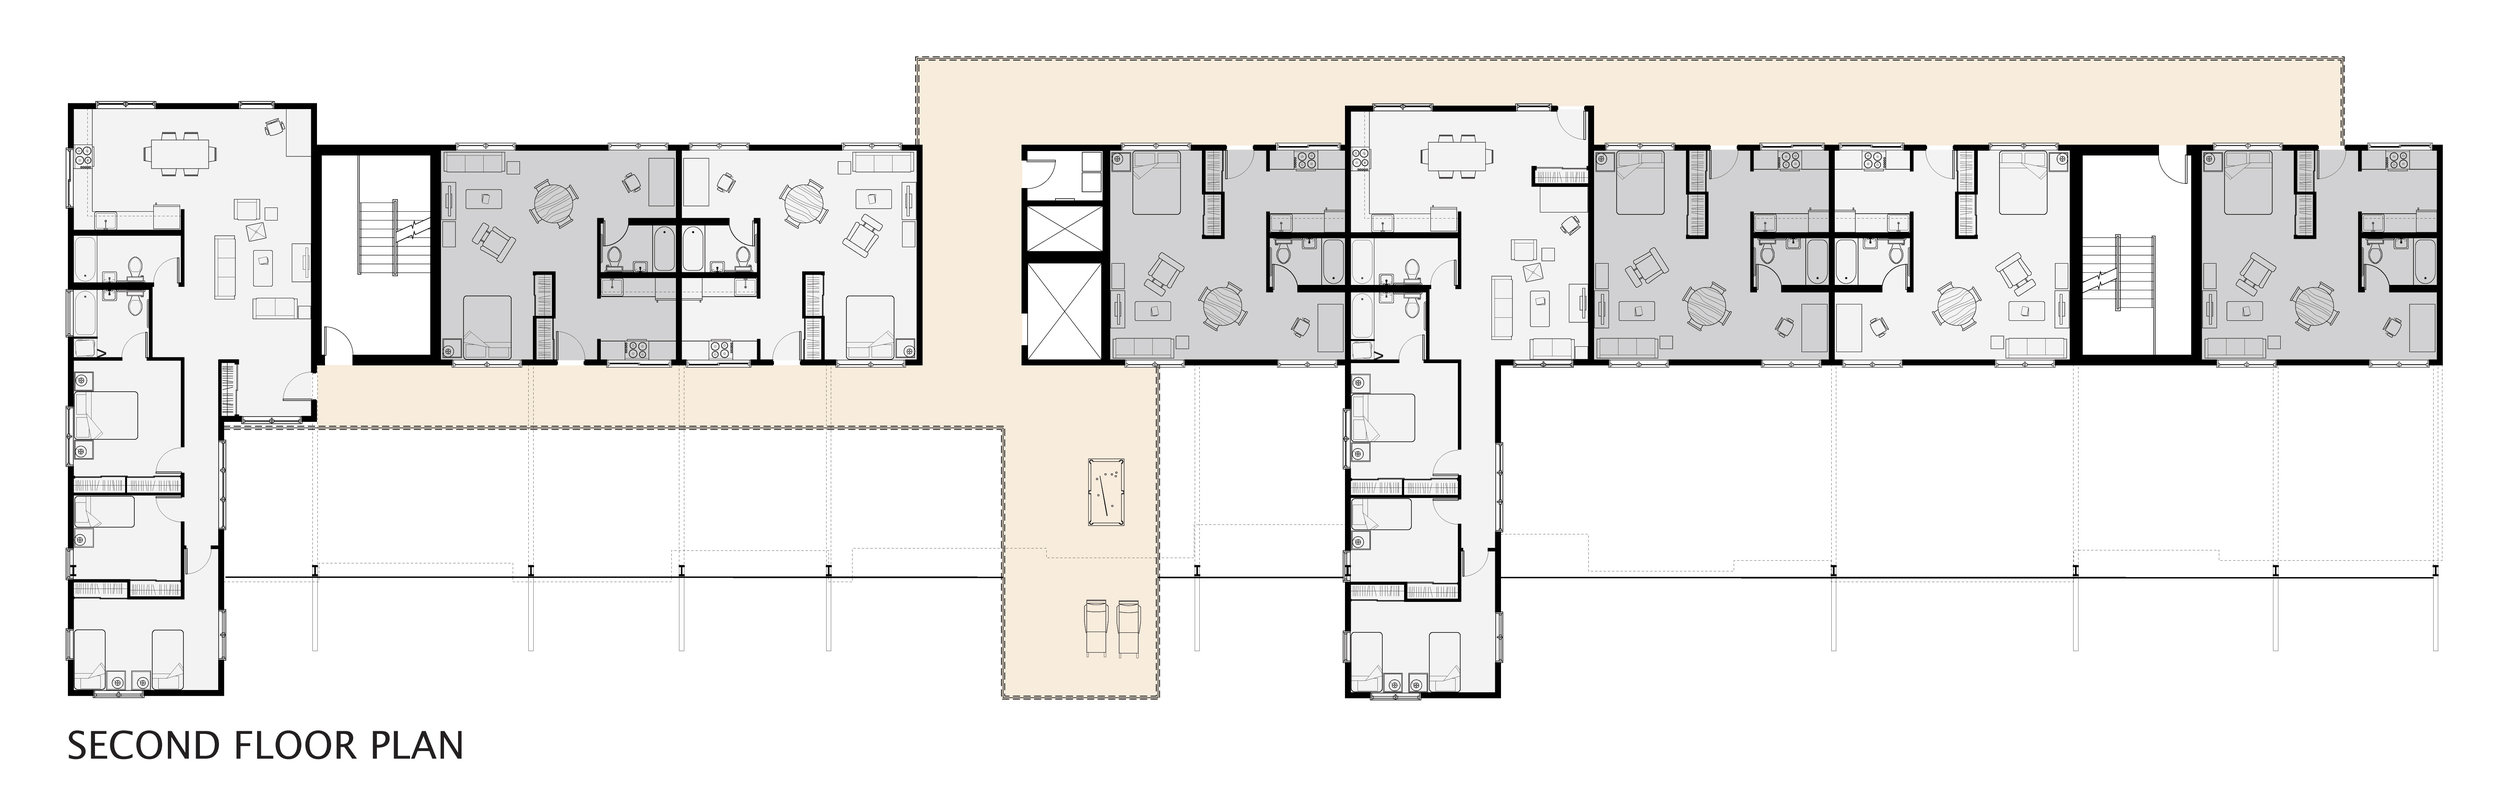 Cabrini Green Apartments Michael Mcbean